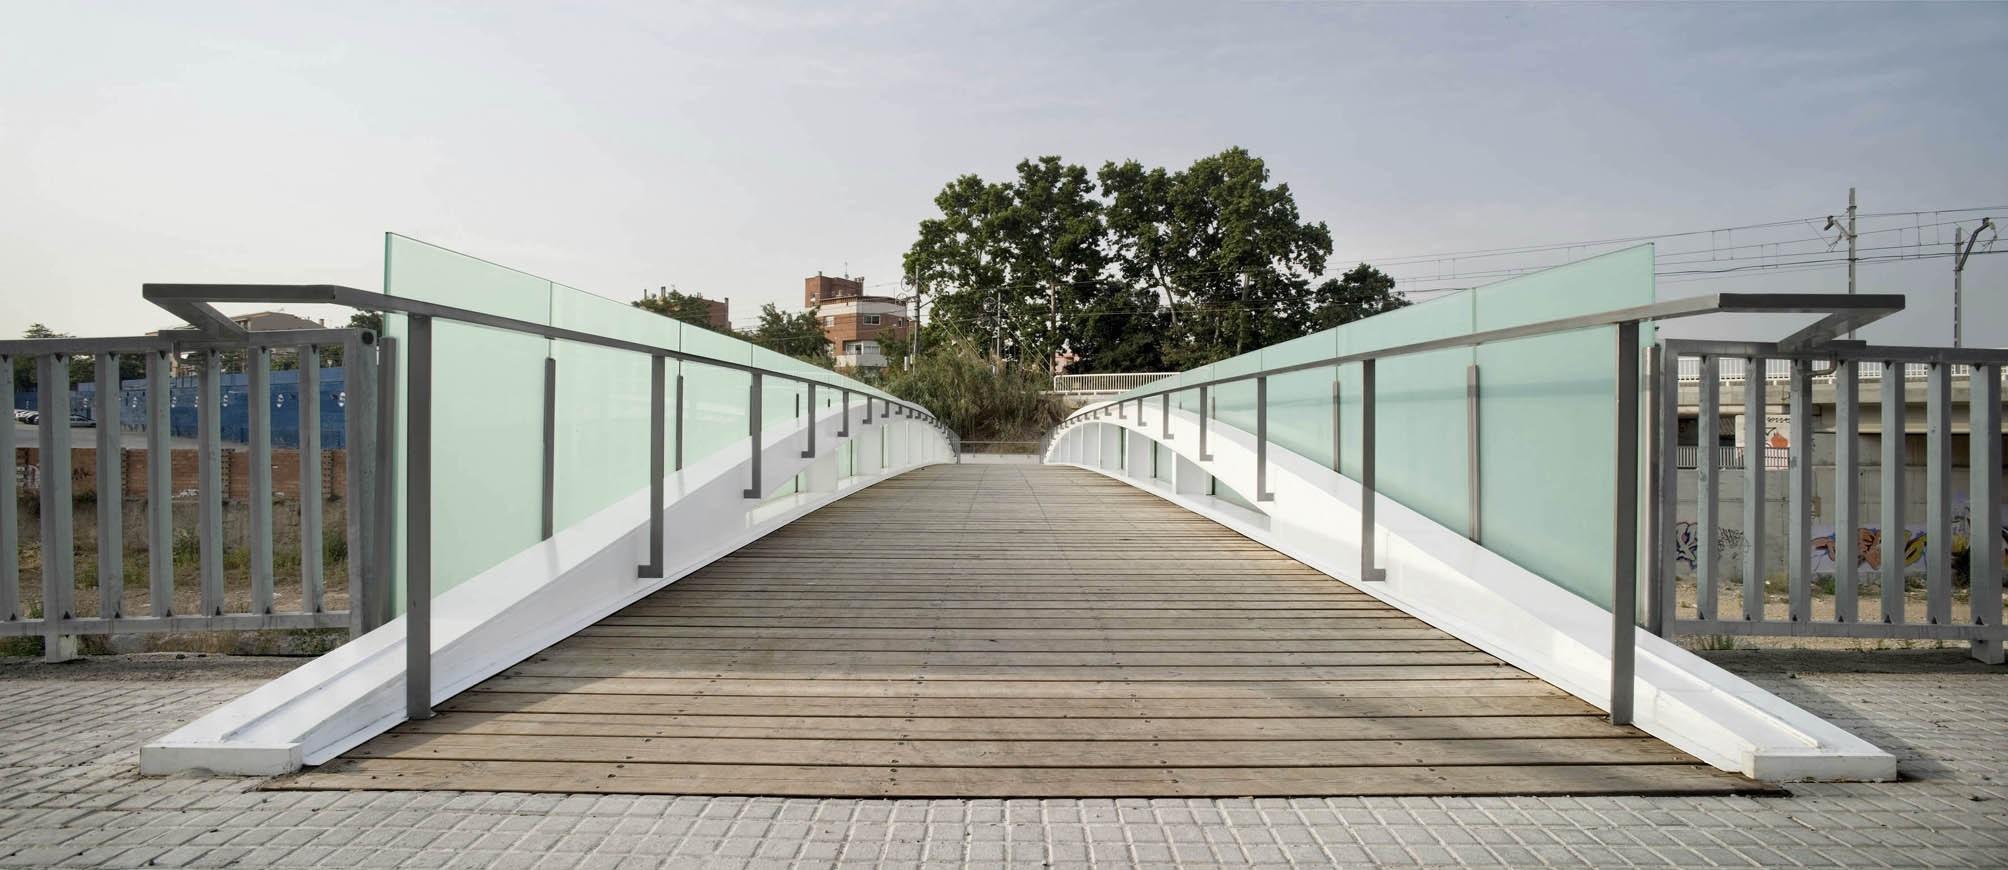 Pasarela de Fontetes, Cerdanyola del Vallès. Fuente: Enginyeria Reventós, SL.